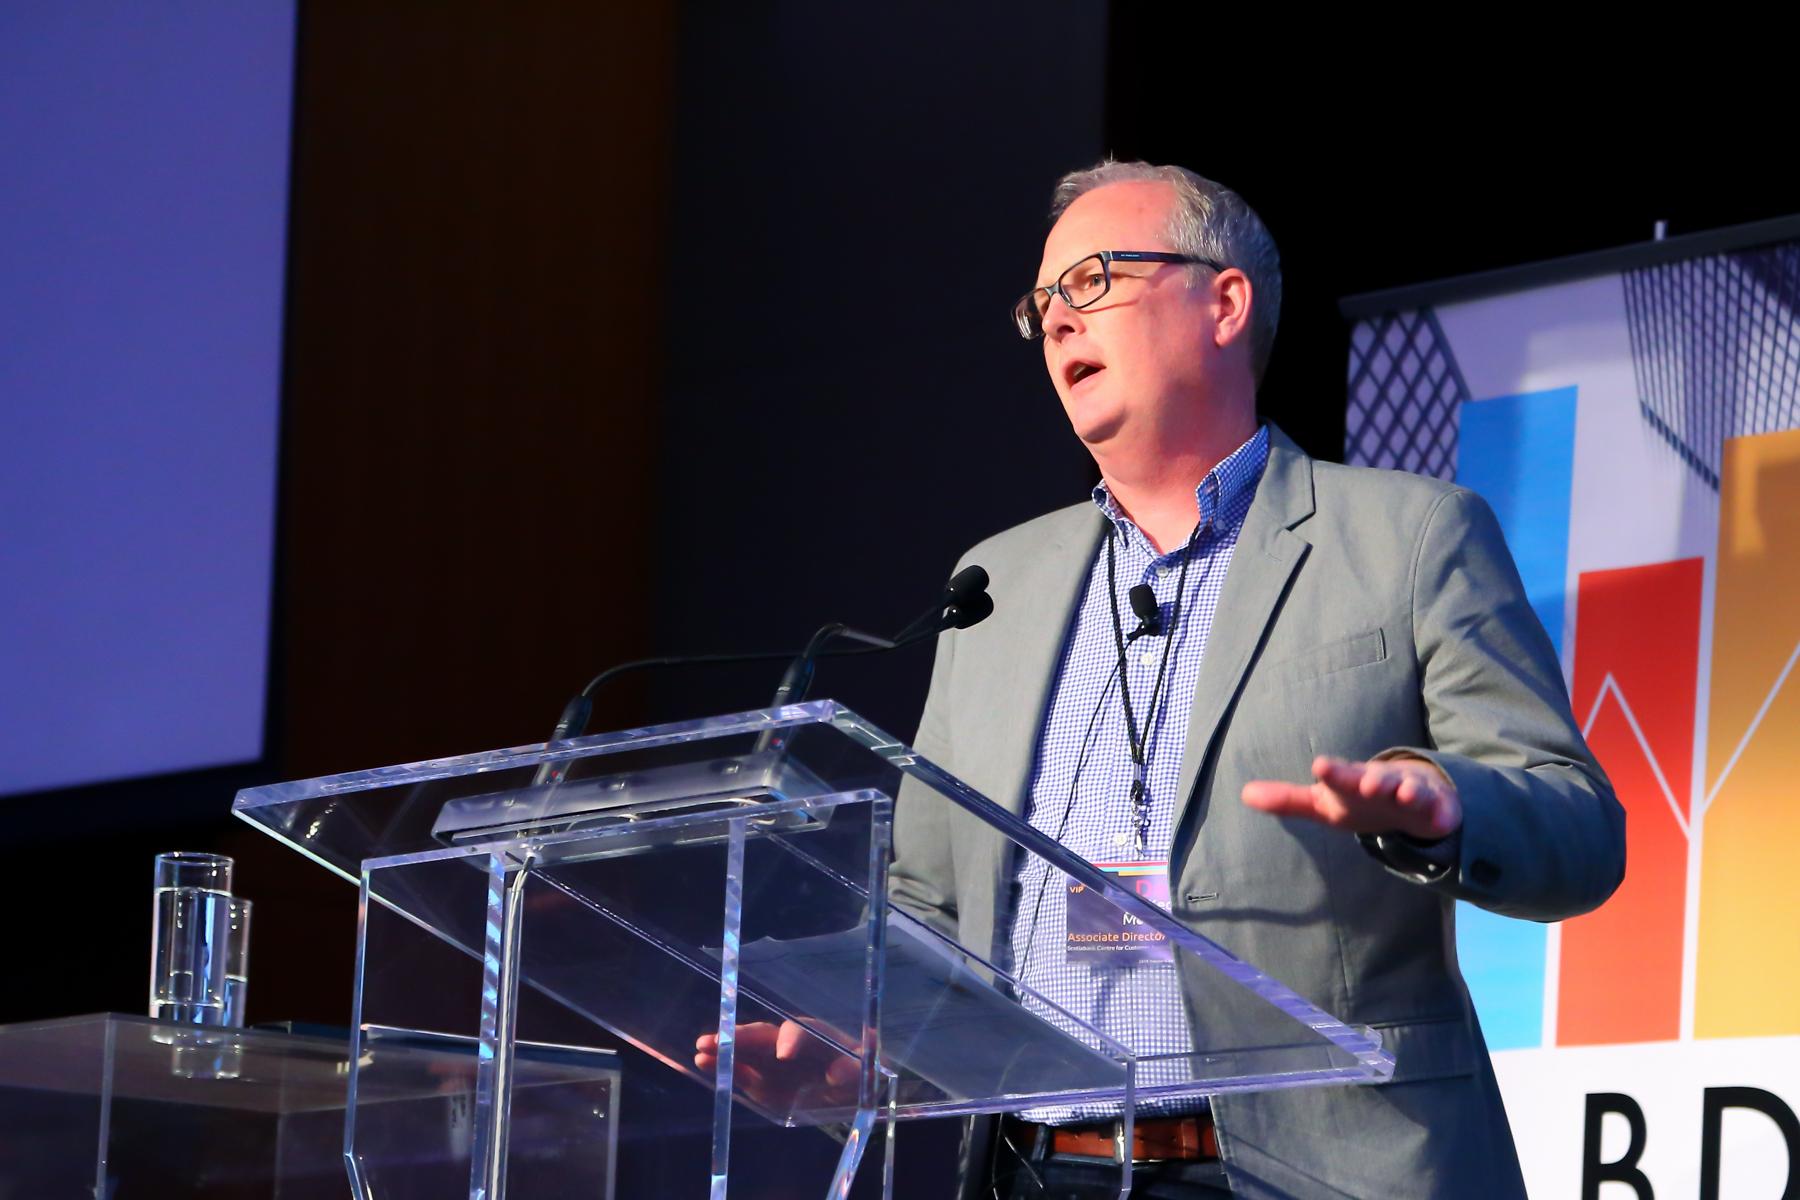 ABD_Conference_2018-099.jpg